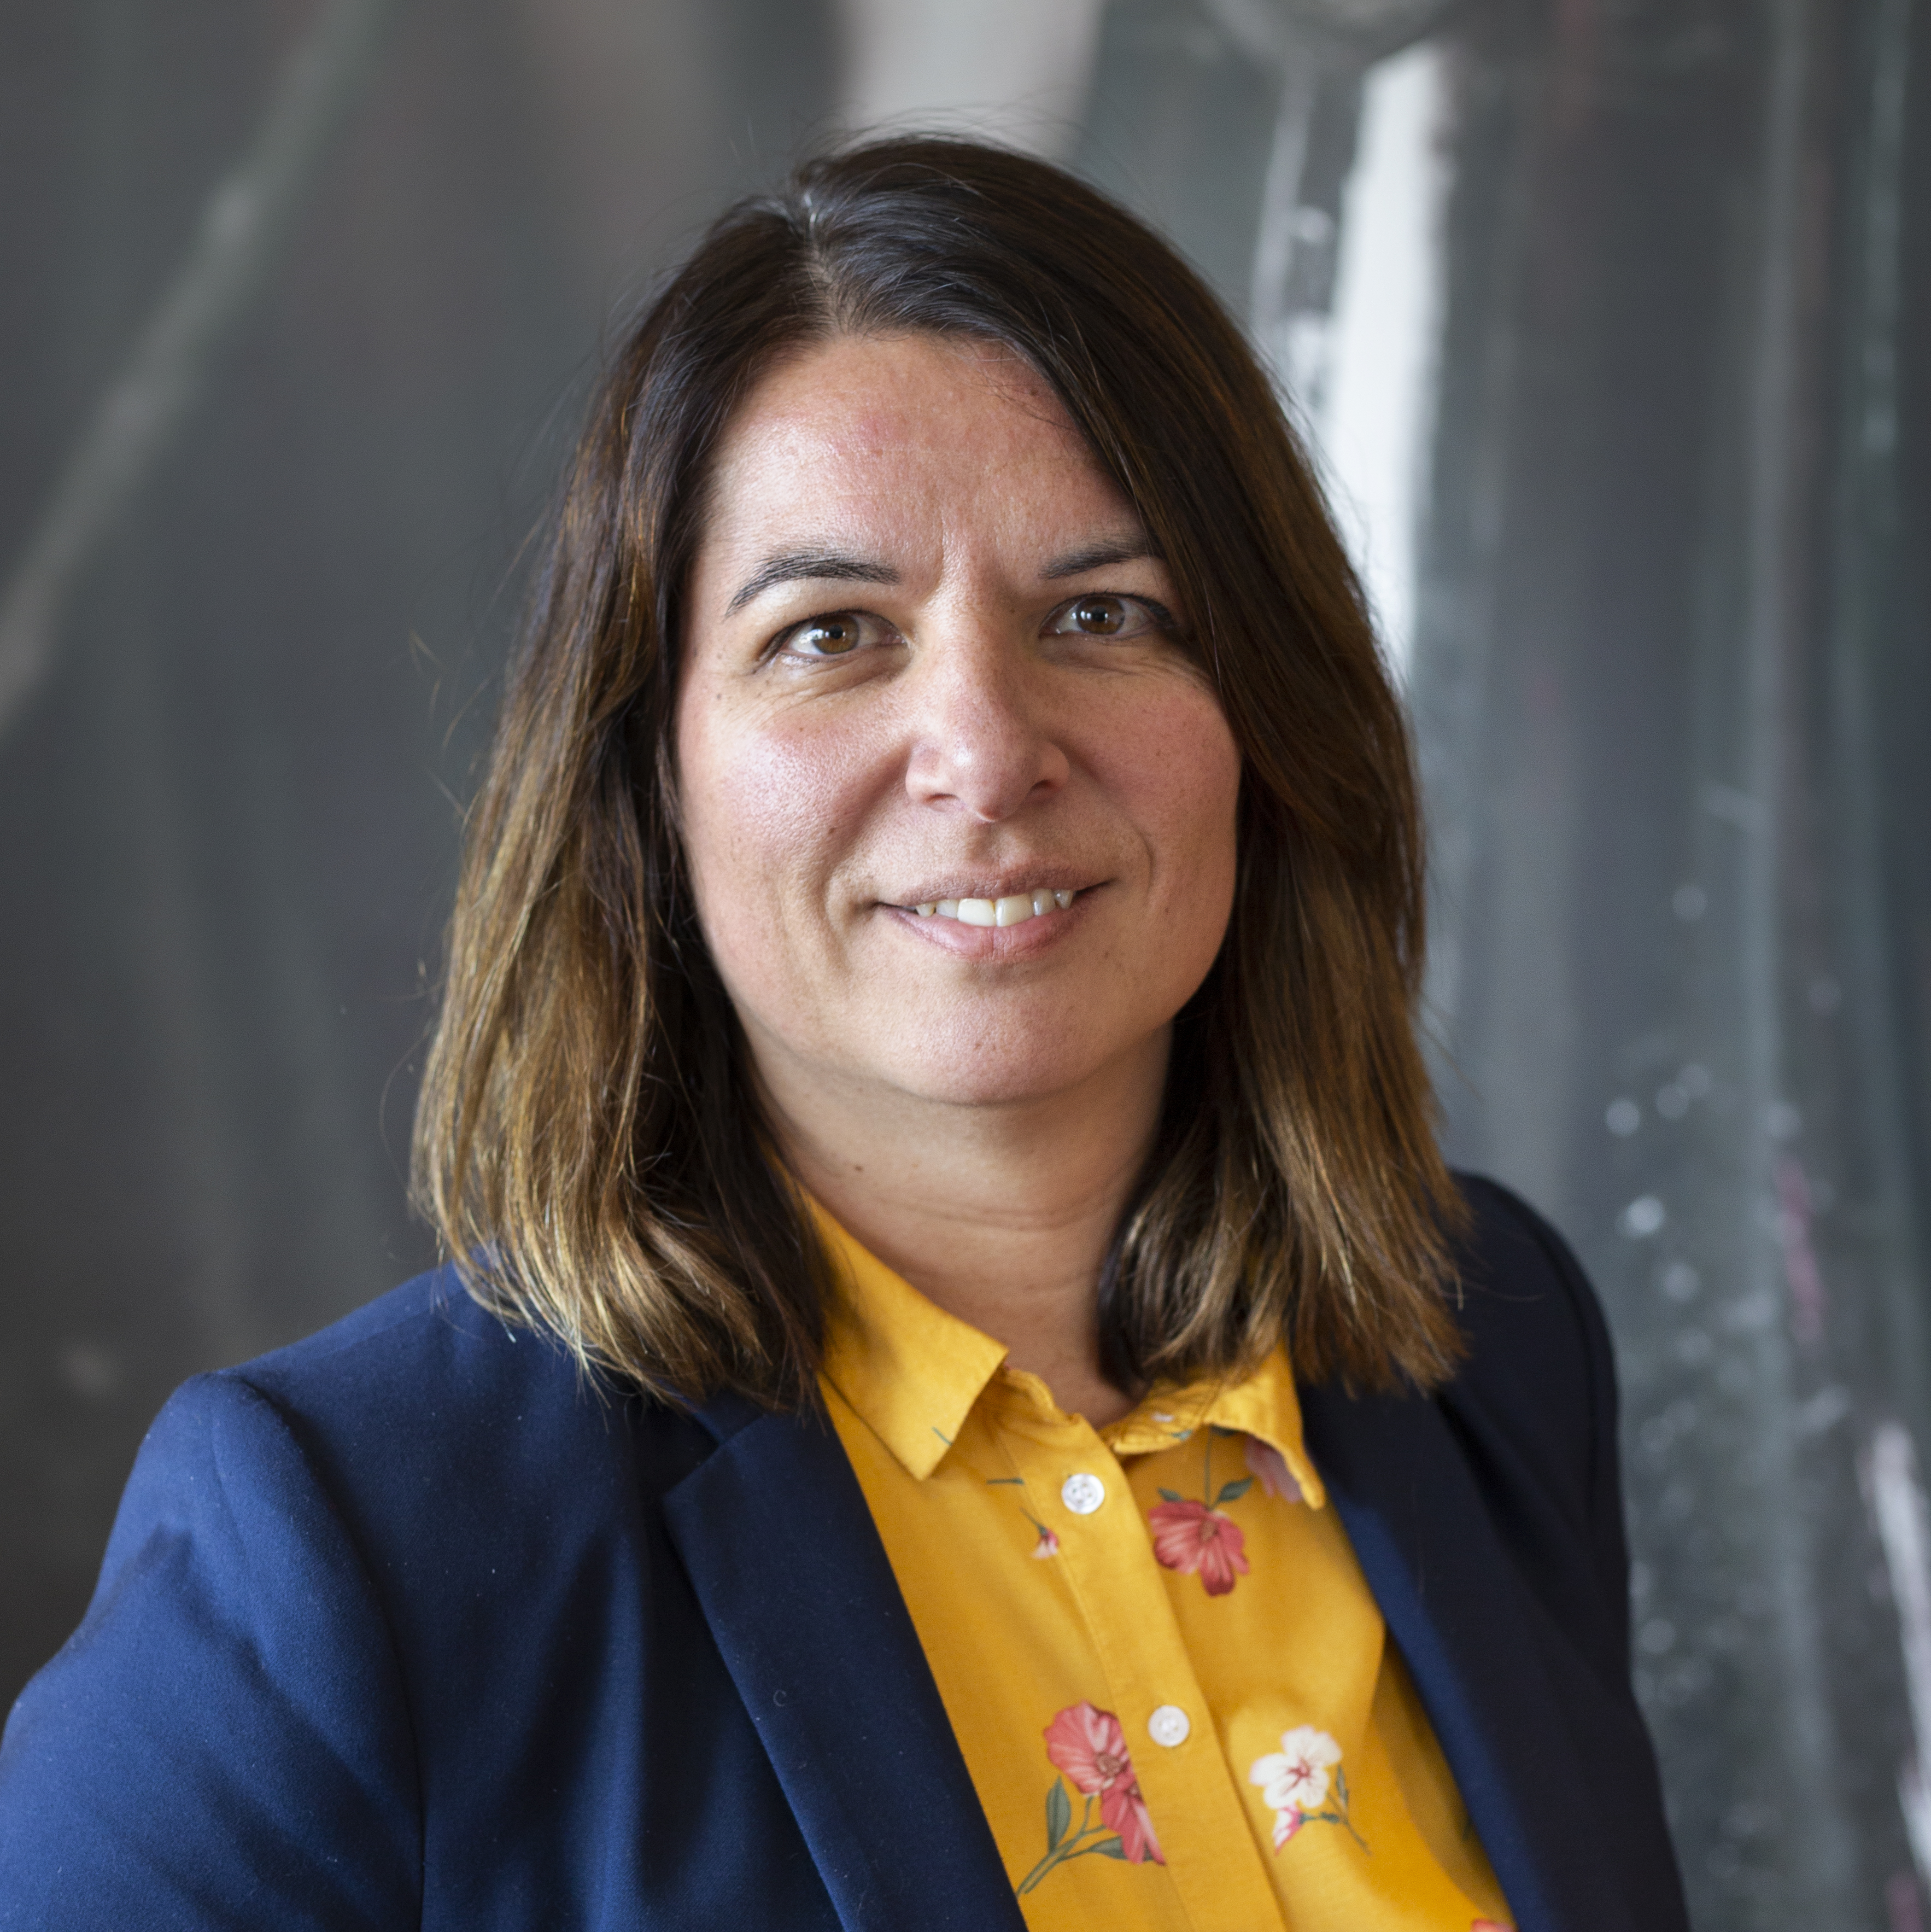 Nadine Emmerik, Argusi 2019